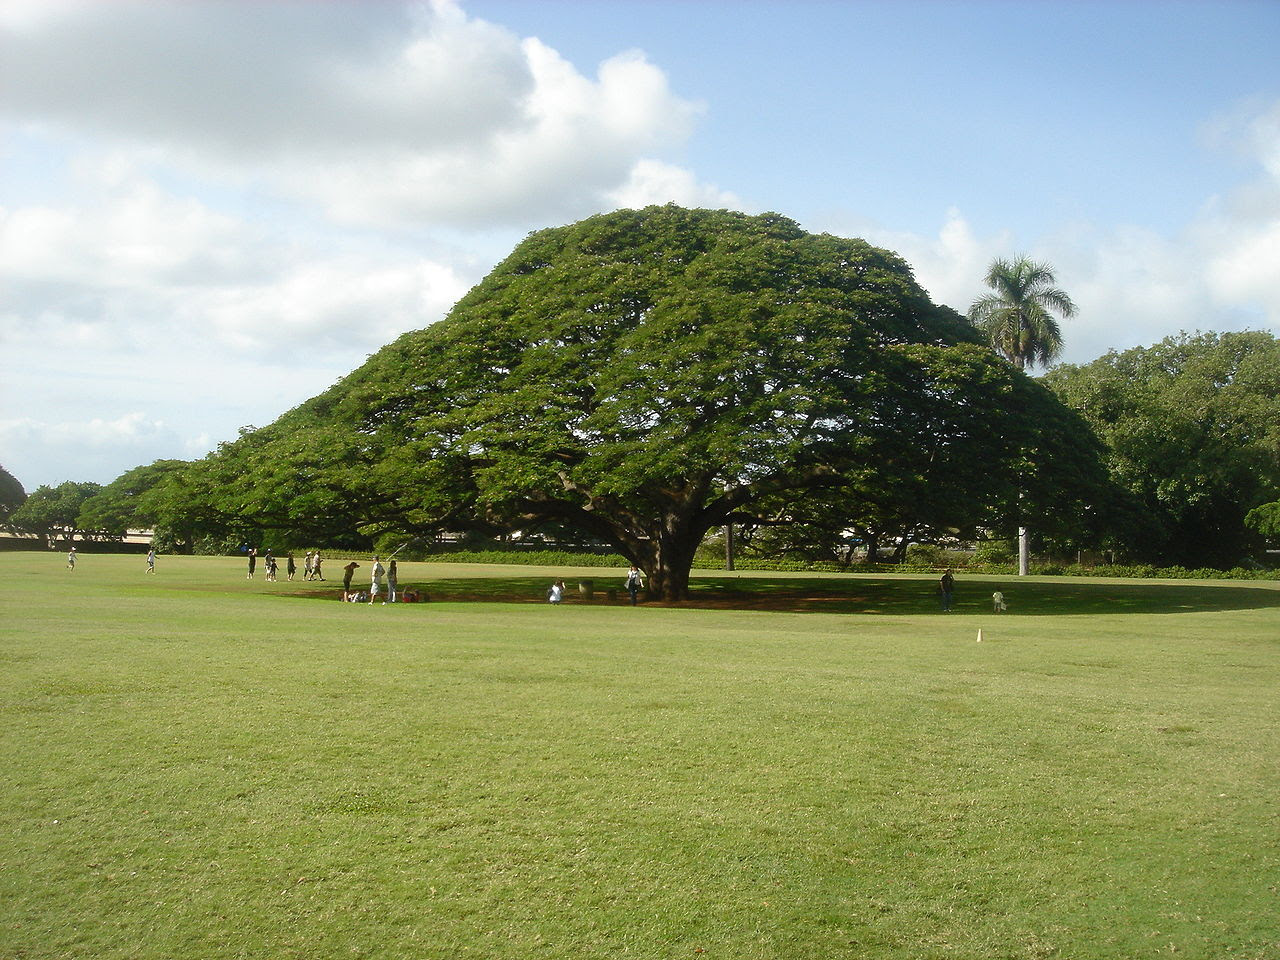 Hitachi's_tree.jpg